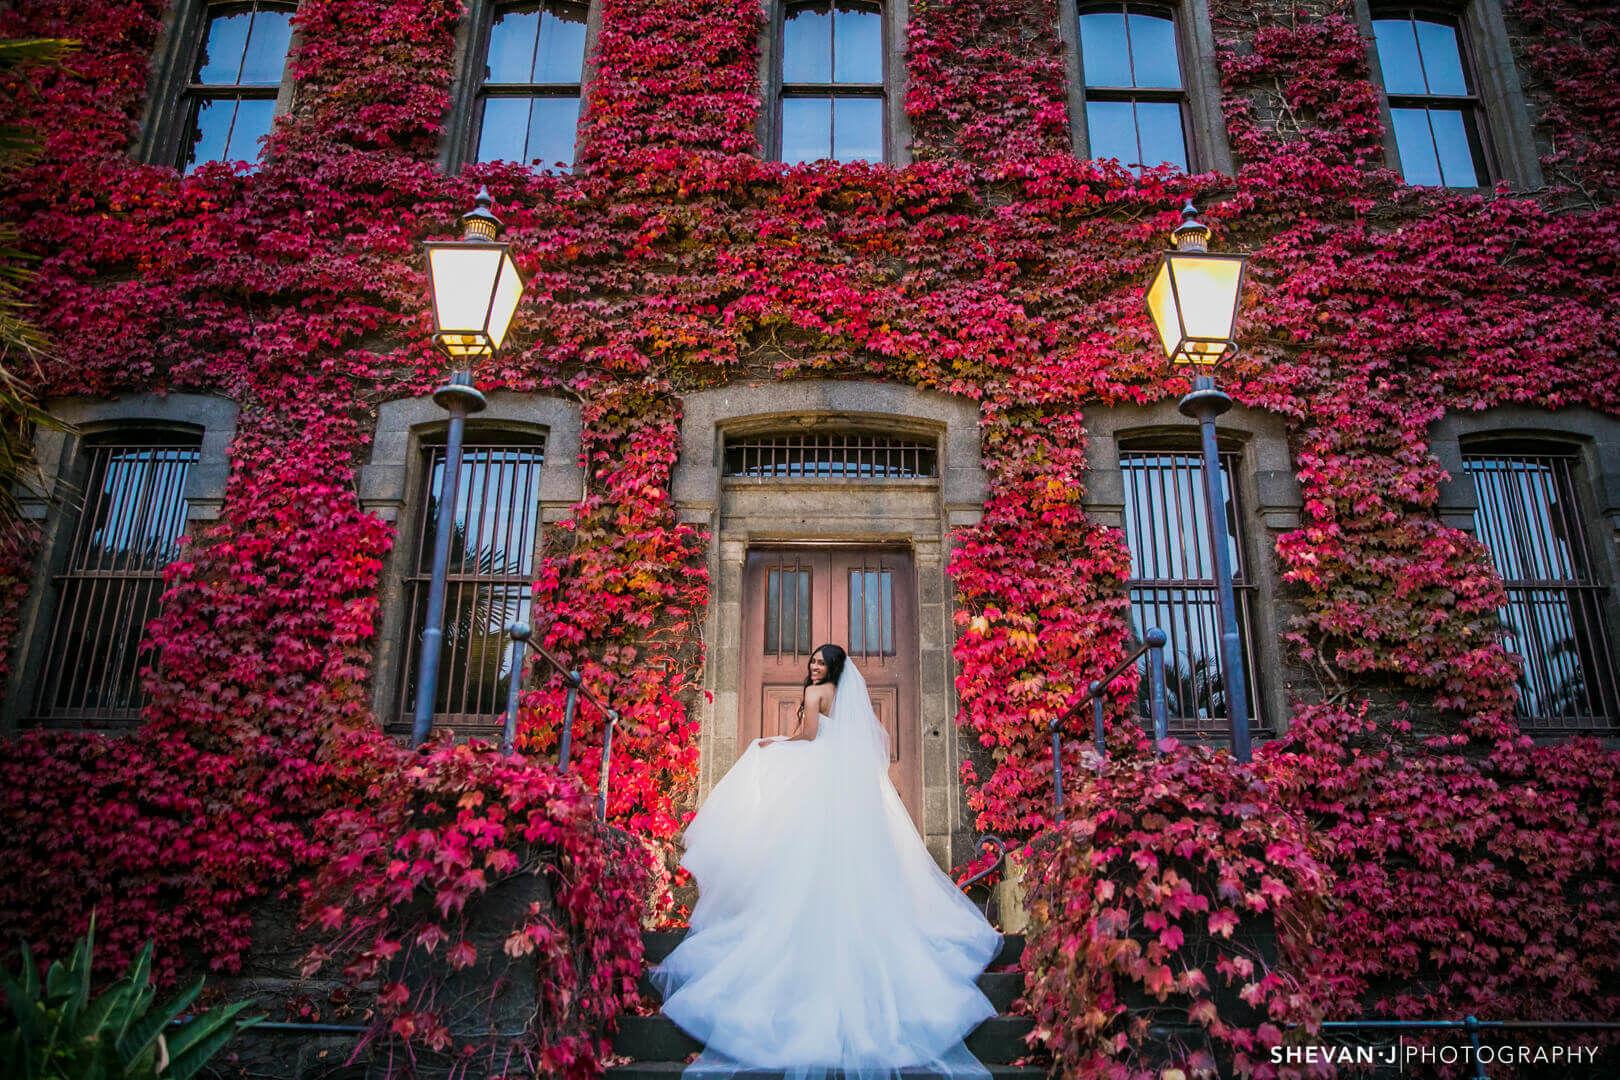 Shevan J Photography - Wedding Photography Melbourne